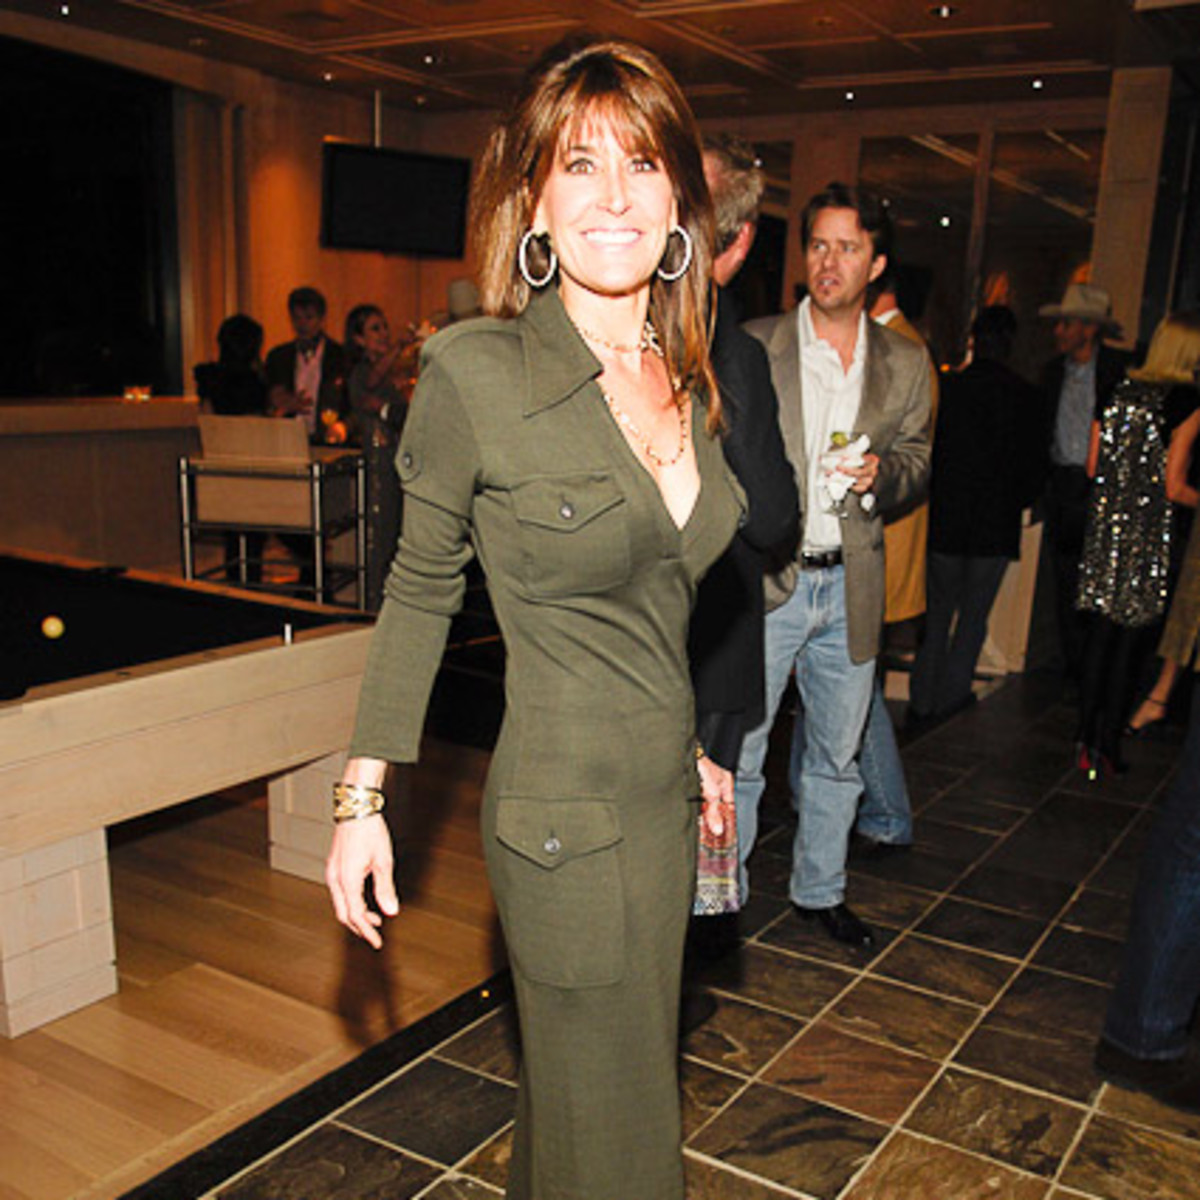 News_Vogue at Becca_Feb. 2010_Annie Amante